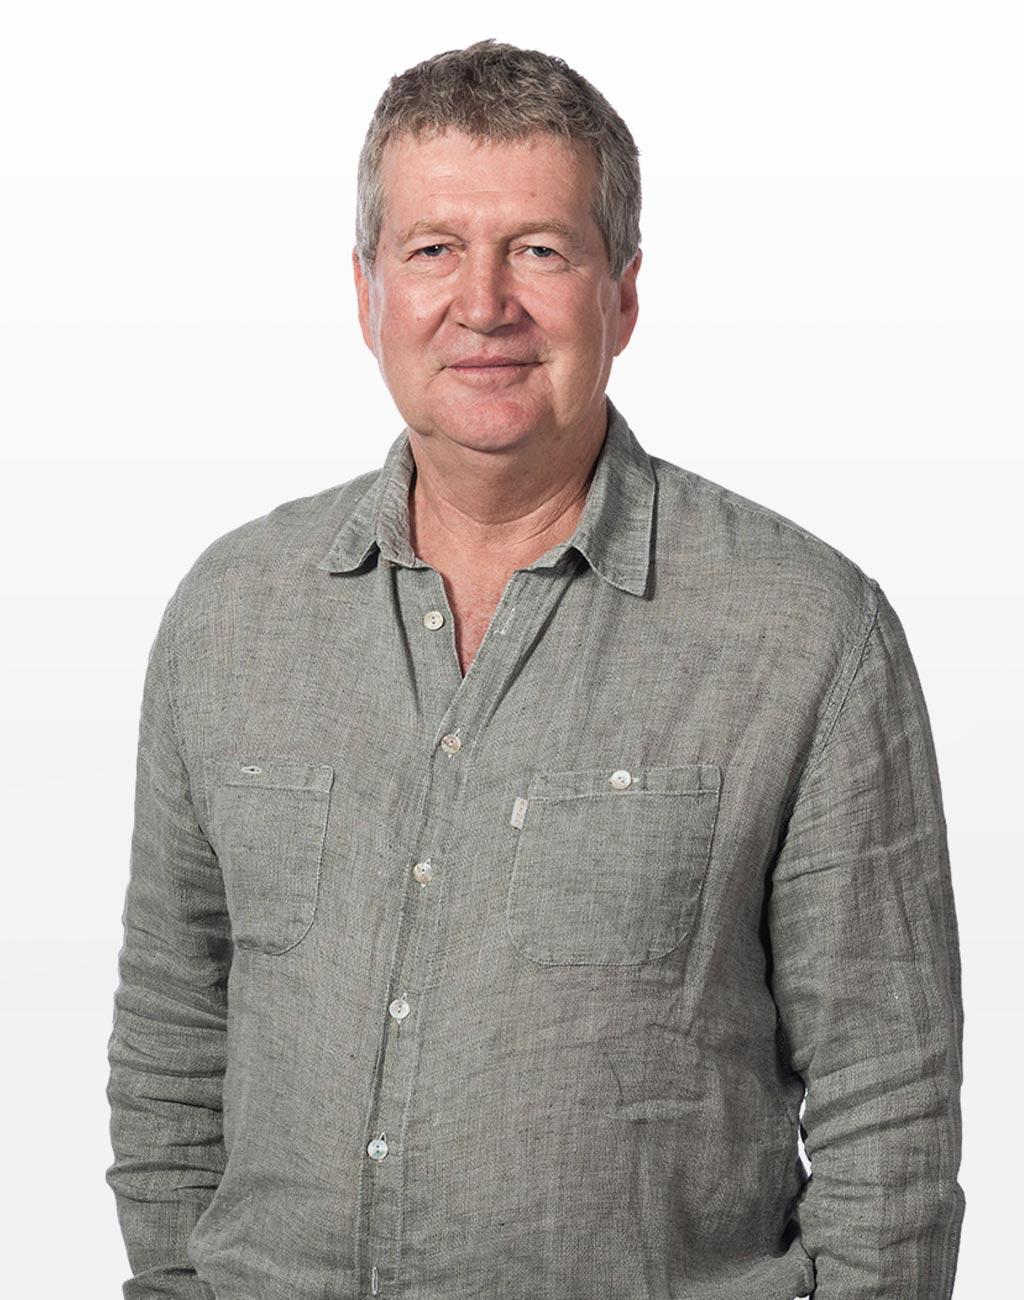 Gerry Holmes